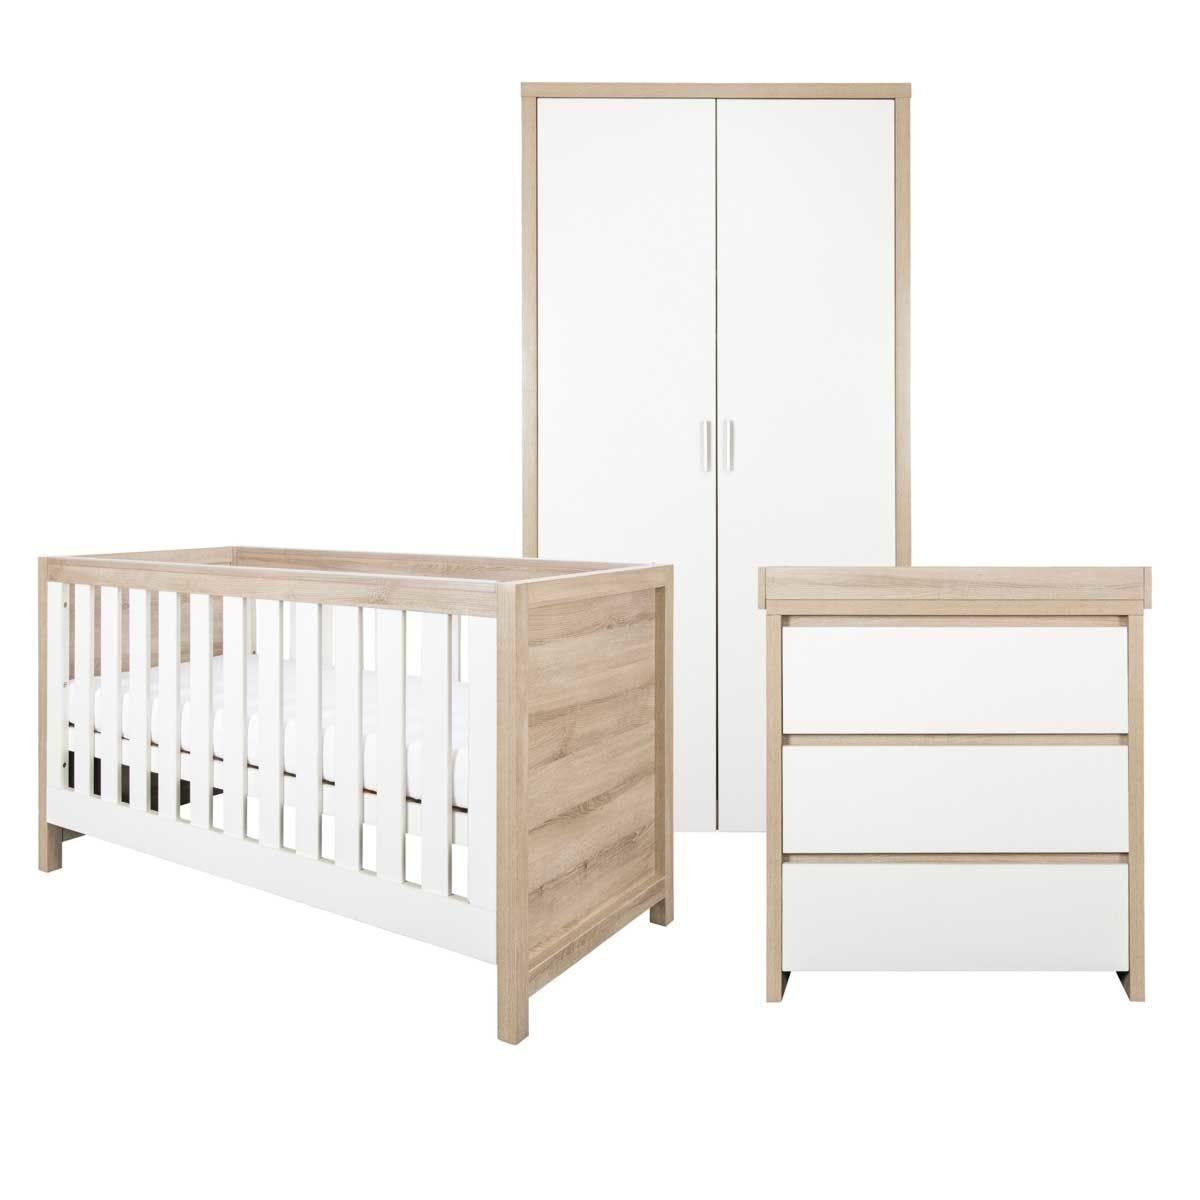 Tutti Bambini Modena 3 Piece Room Set – White and Oak